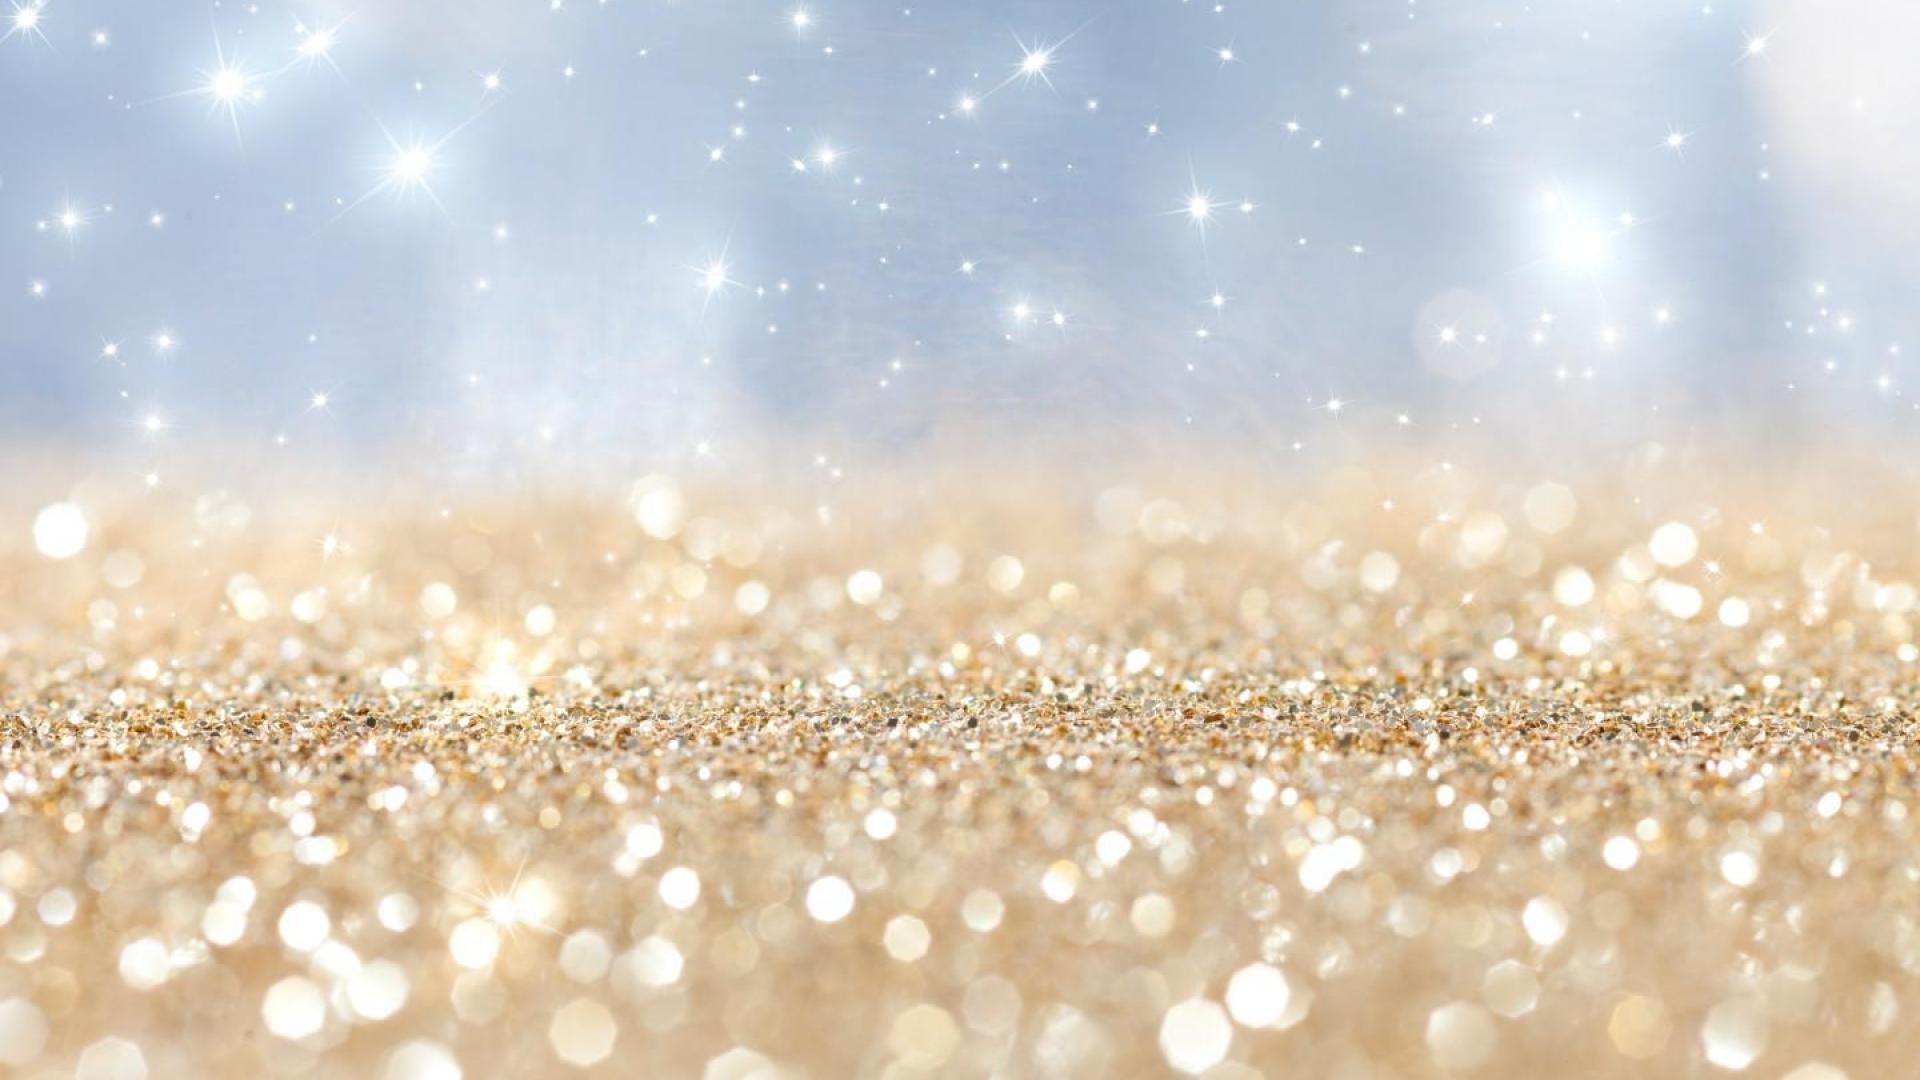 Glitter Wallpapers | Best Wallpapers